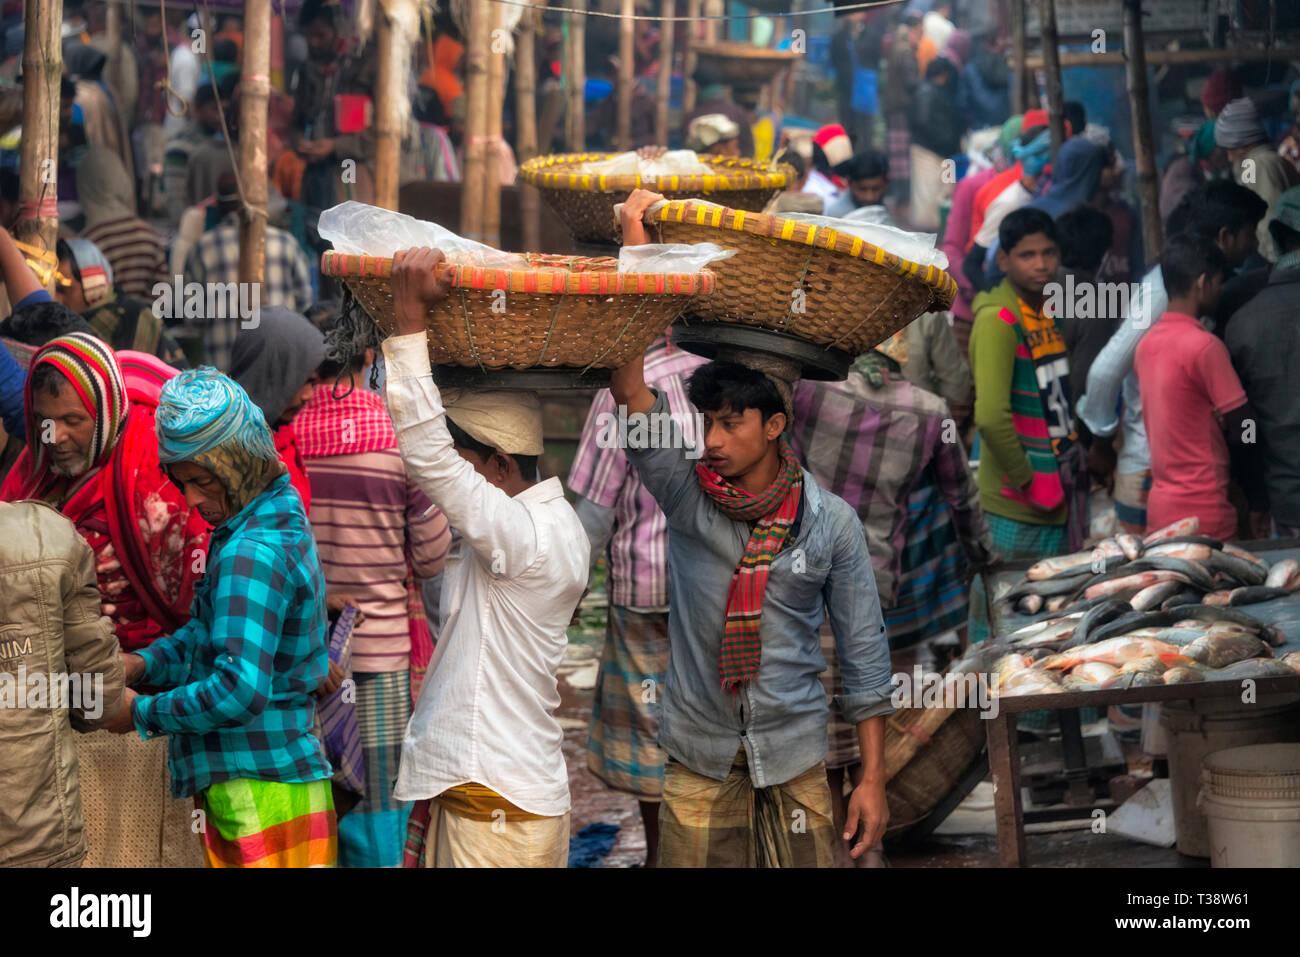 Fish market, Dhaka, Bangladesh - Stock Image